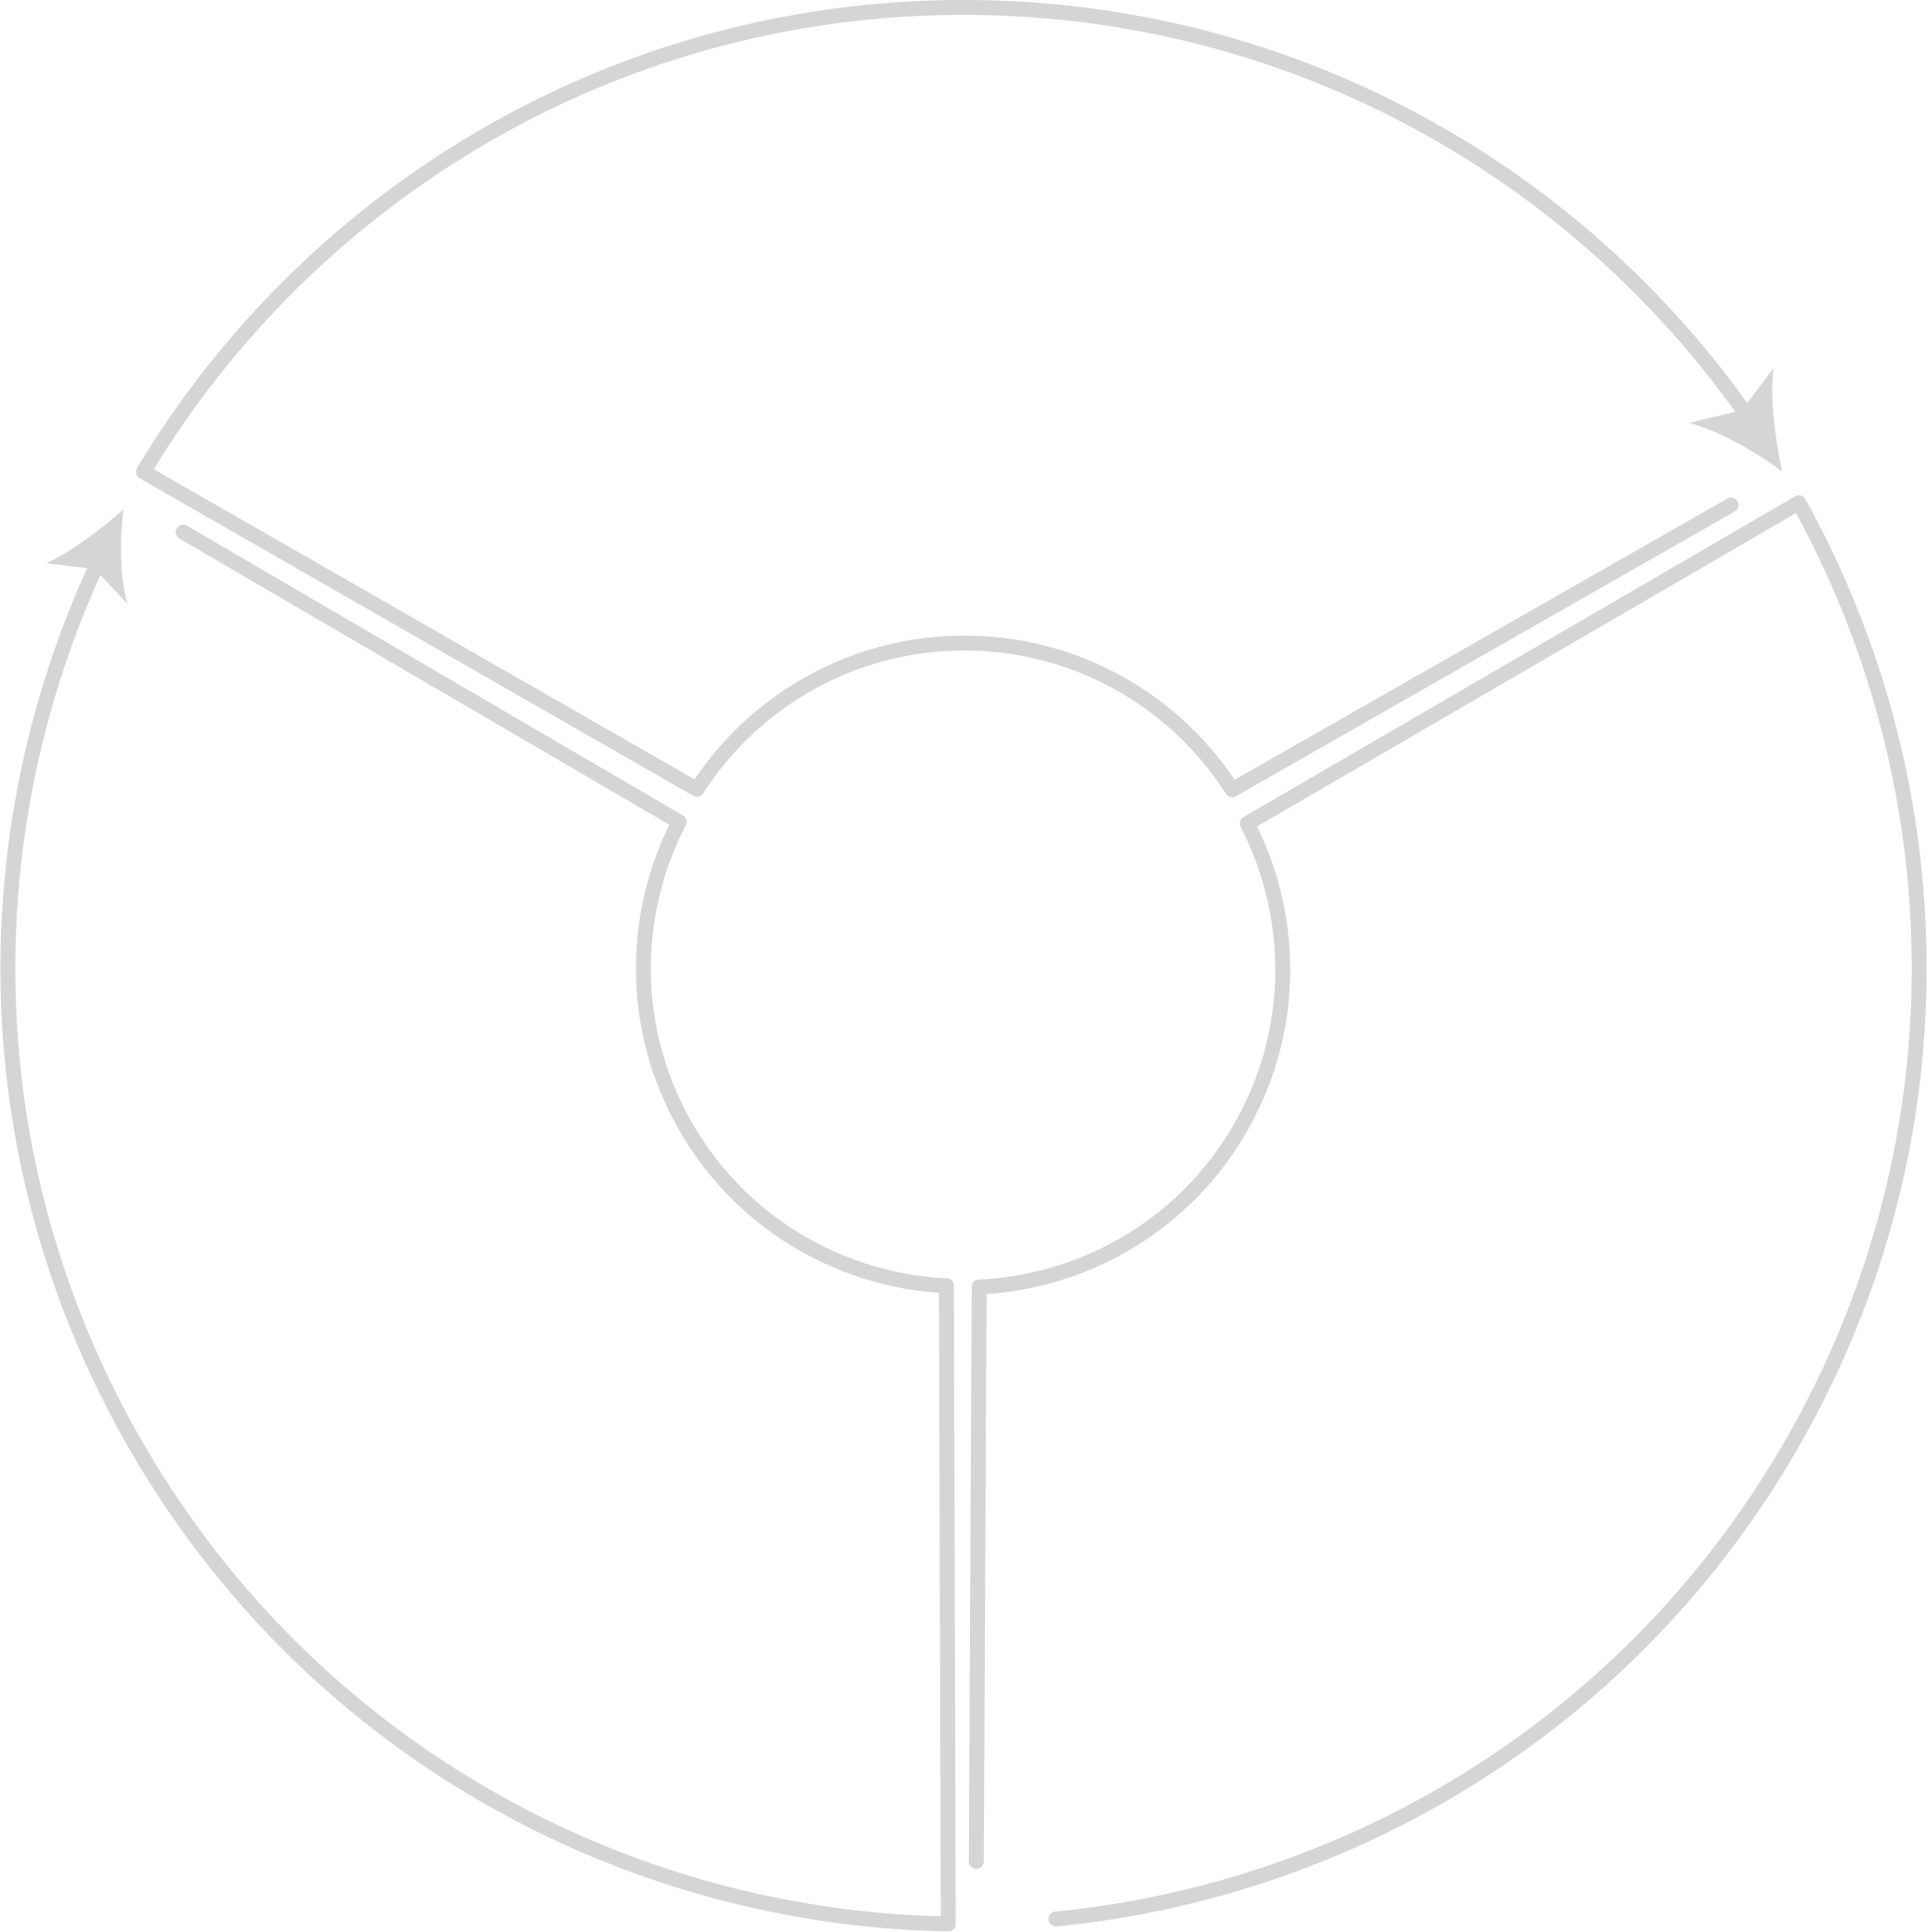 solution-circle